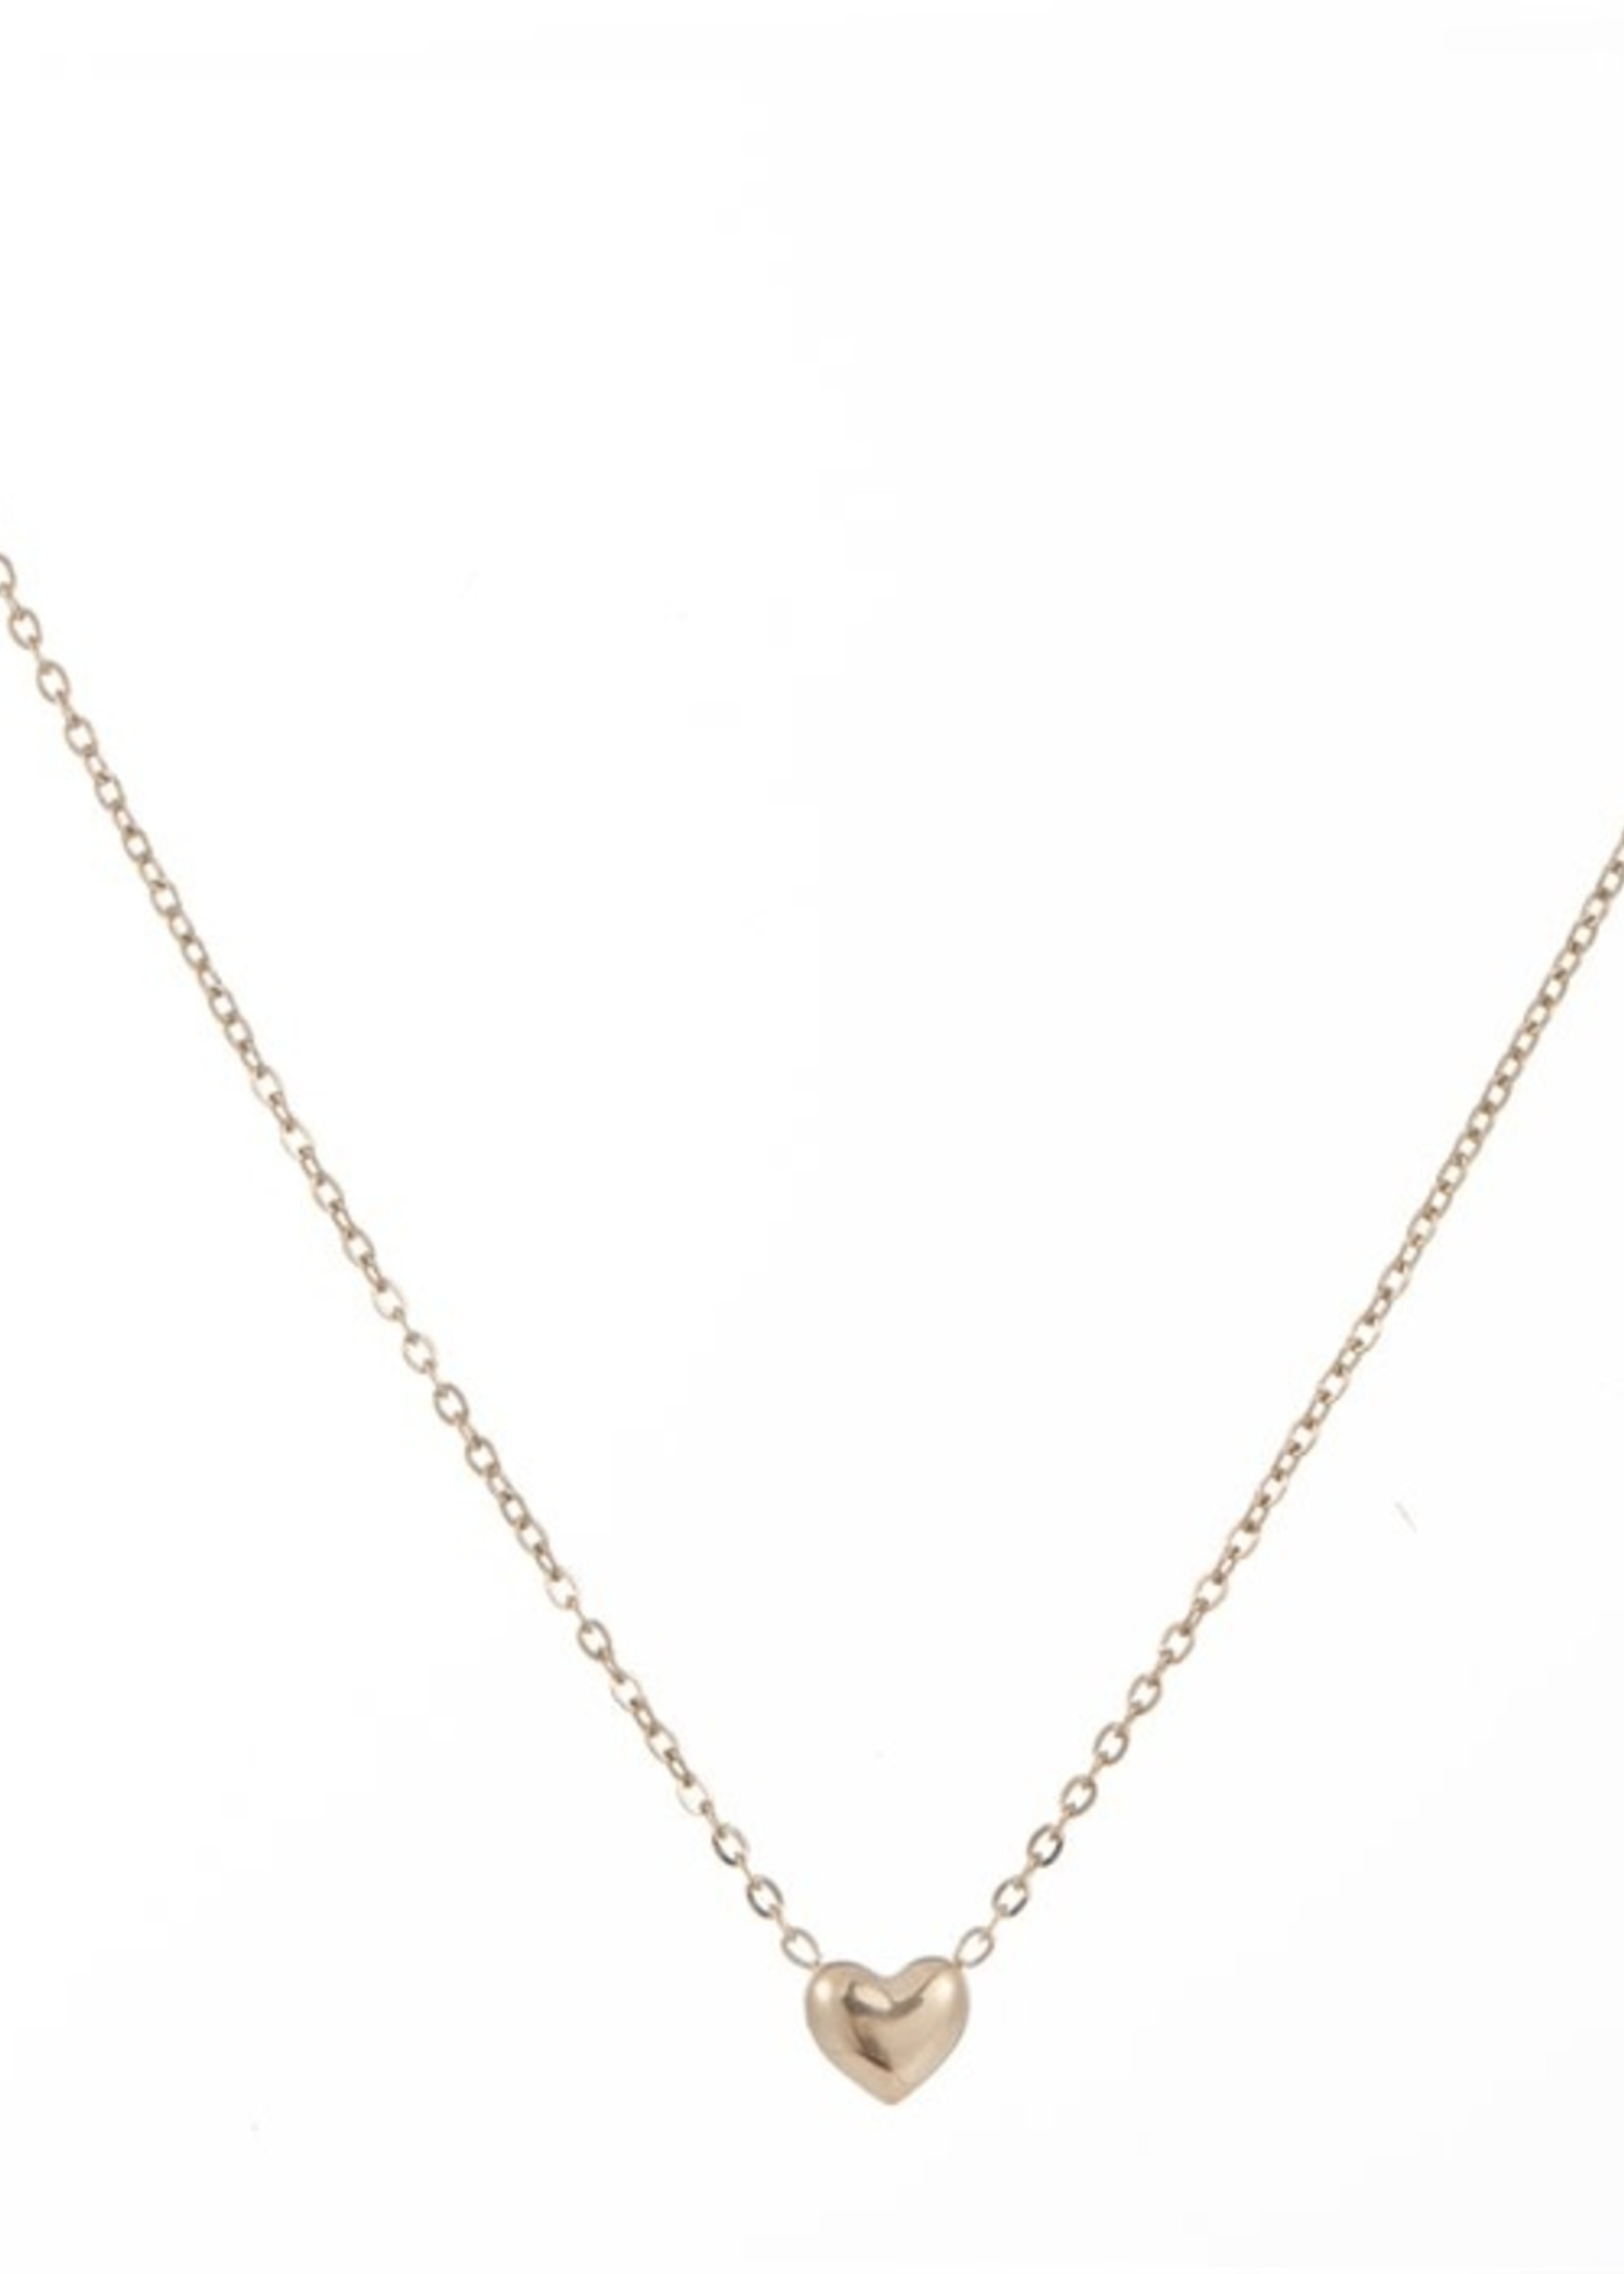 Ketting goud hartje N8829-2